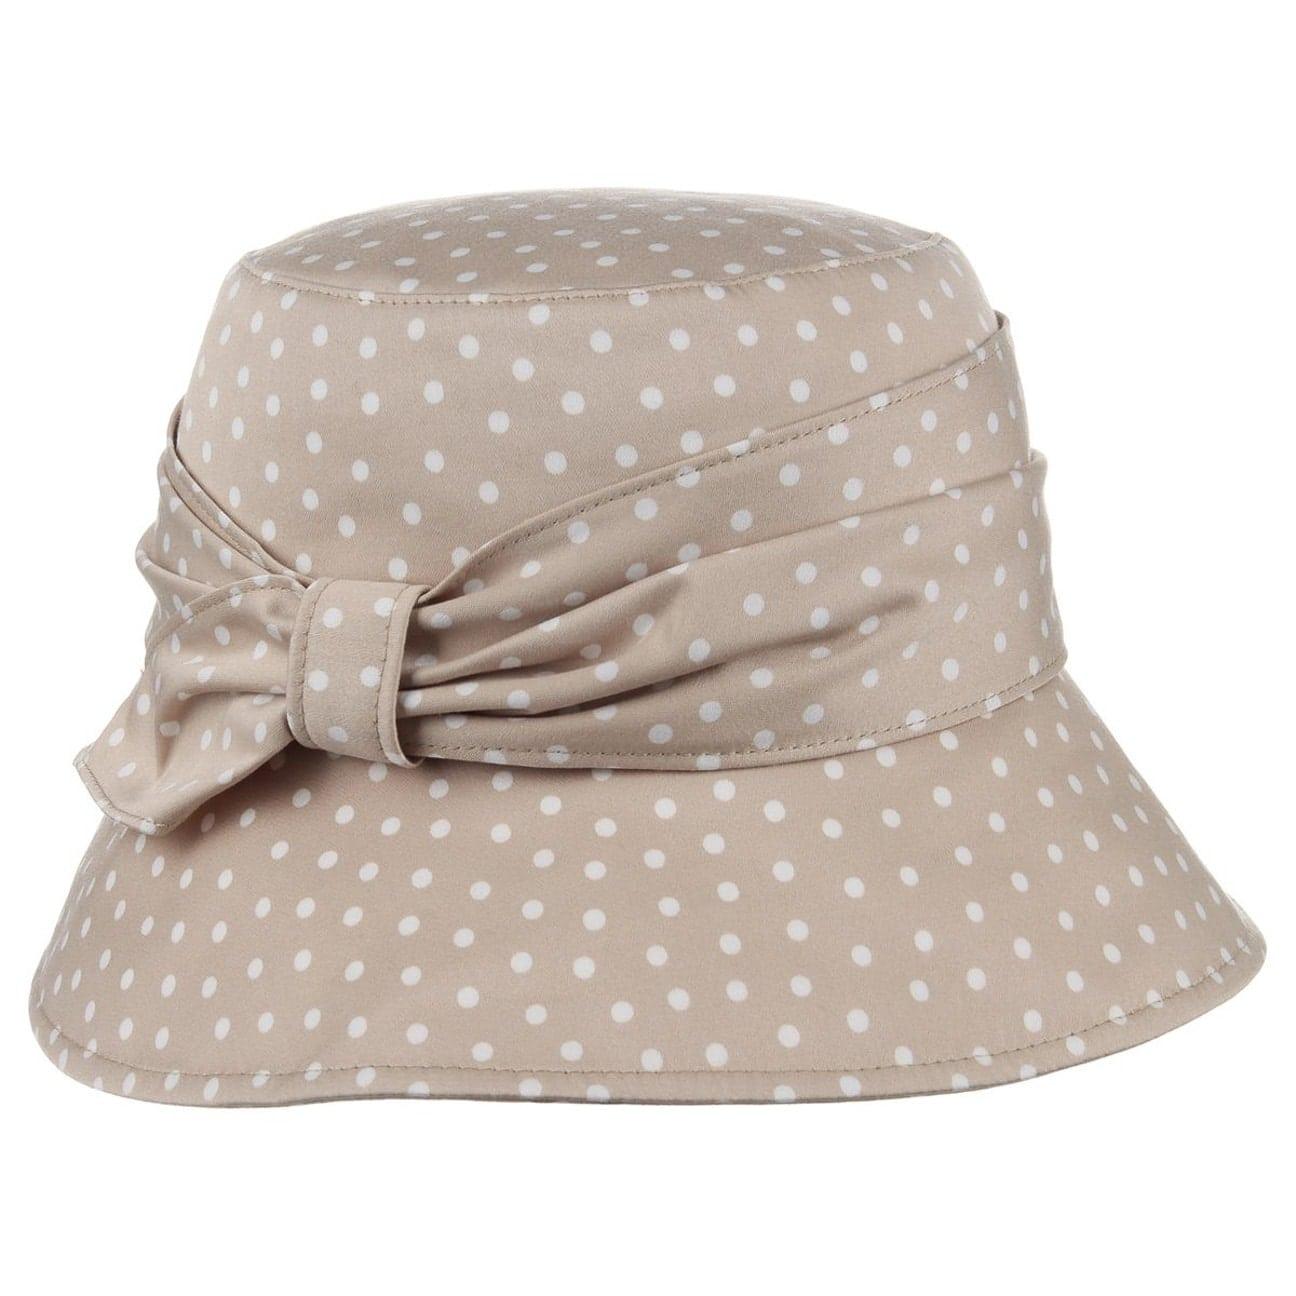 Sombrero Lluvia Bessa by Bront?  sombrero de tela